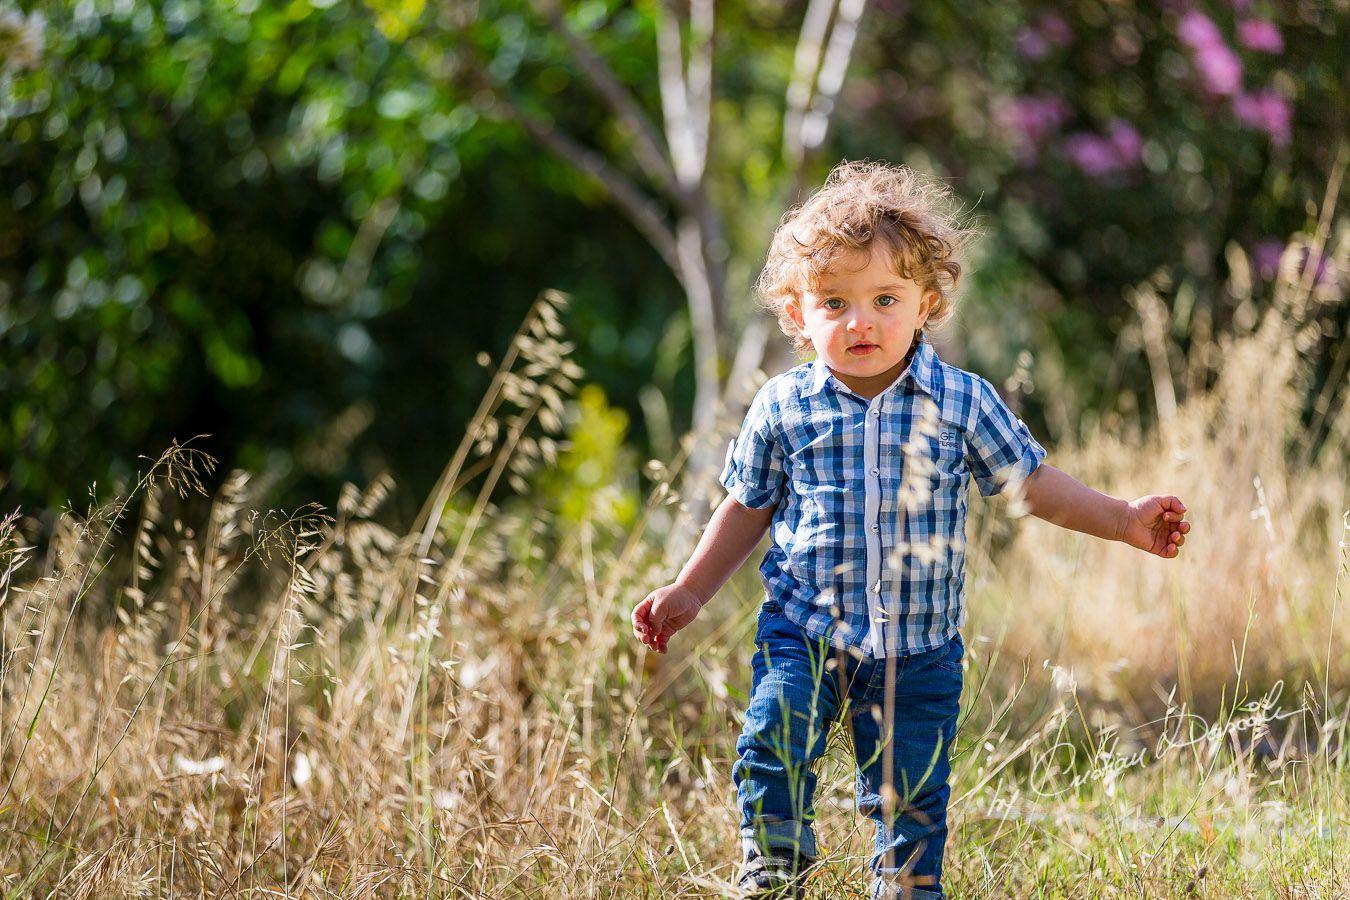 Harry playing on the grass near Curium Beach, Cyprus. Photographer: Cristian Dascalu